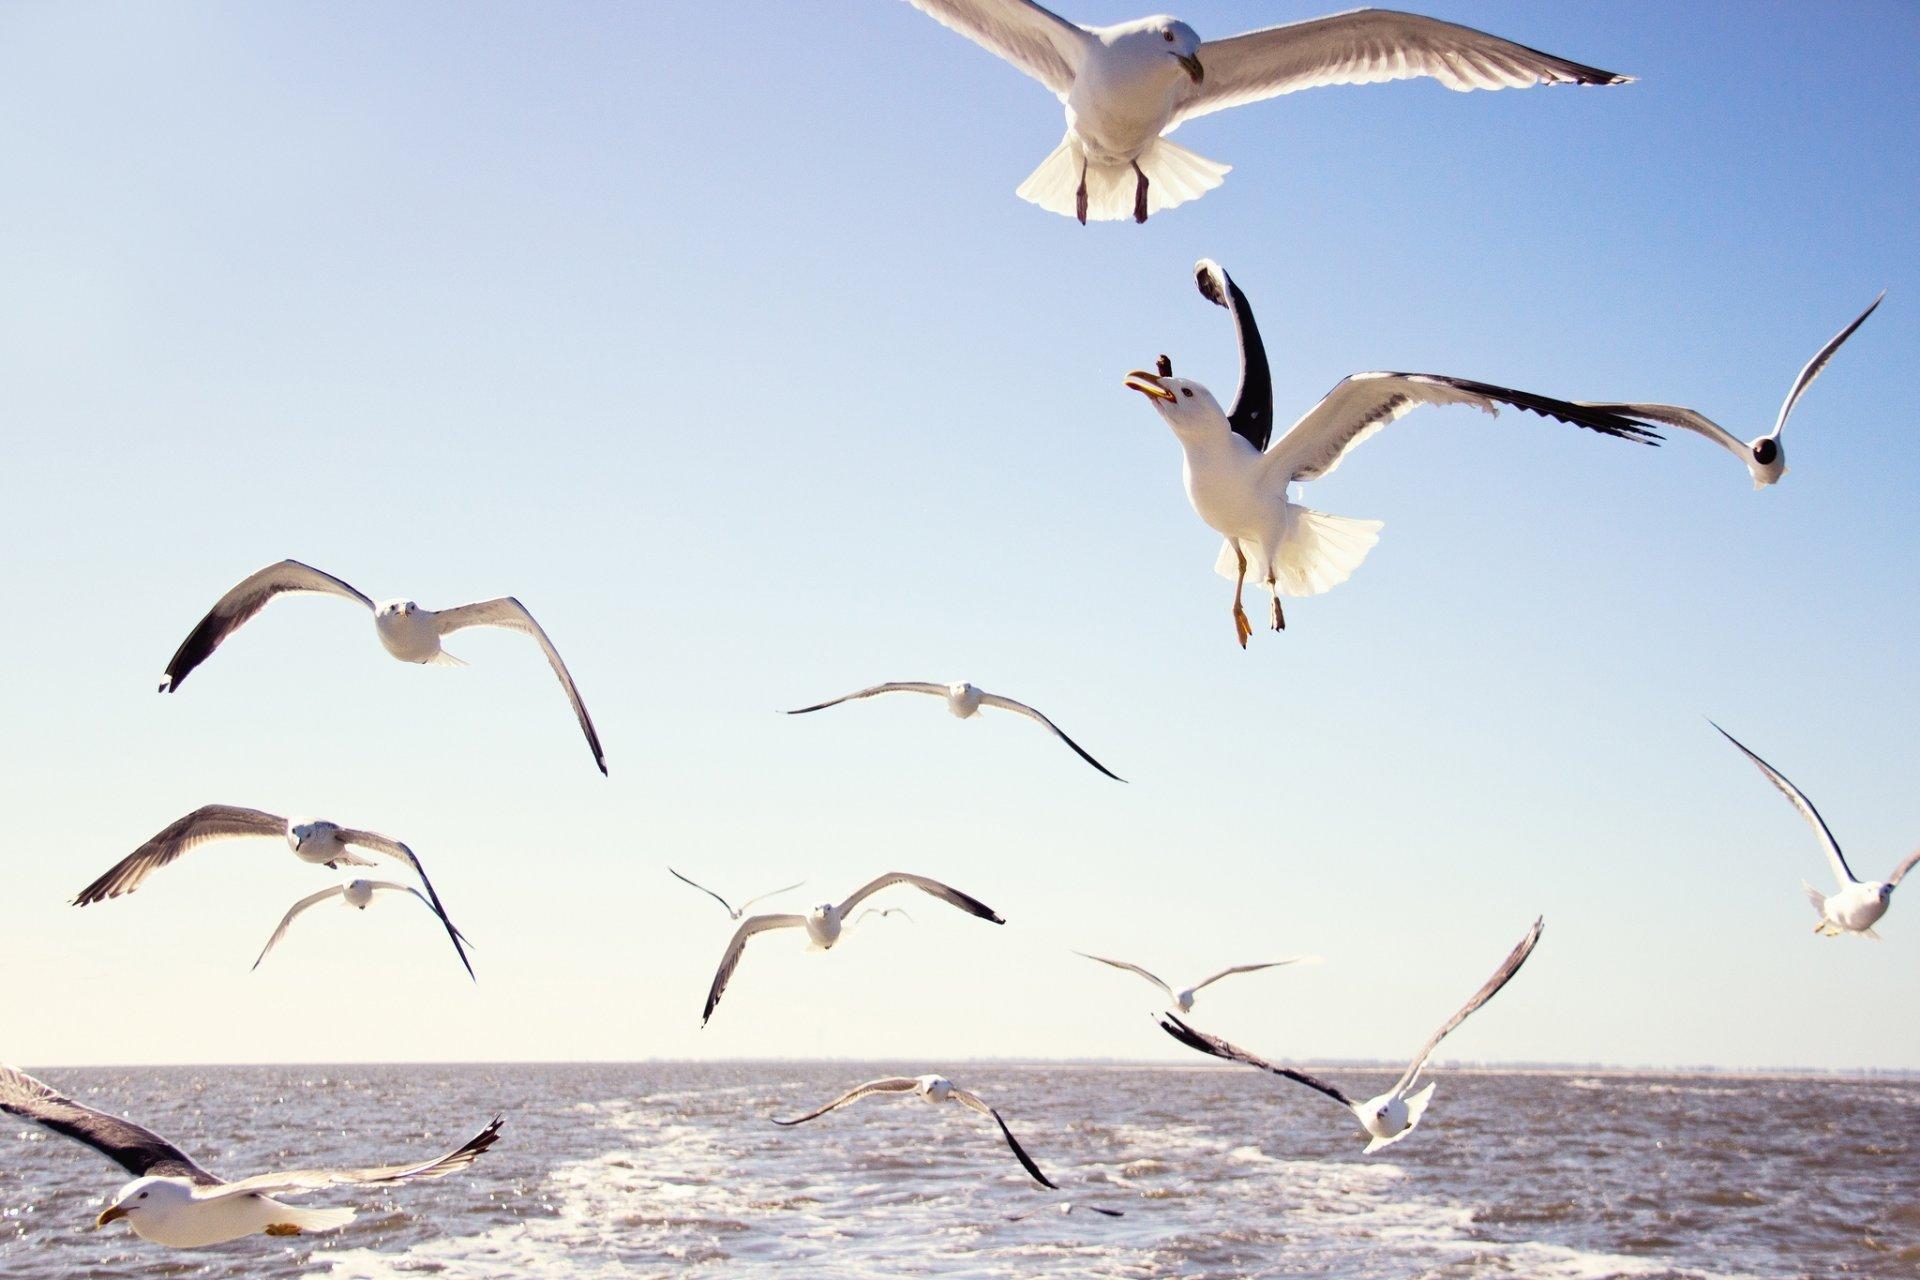 перед фото летящих чаек над морем наврал